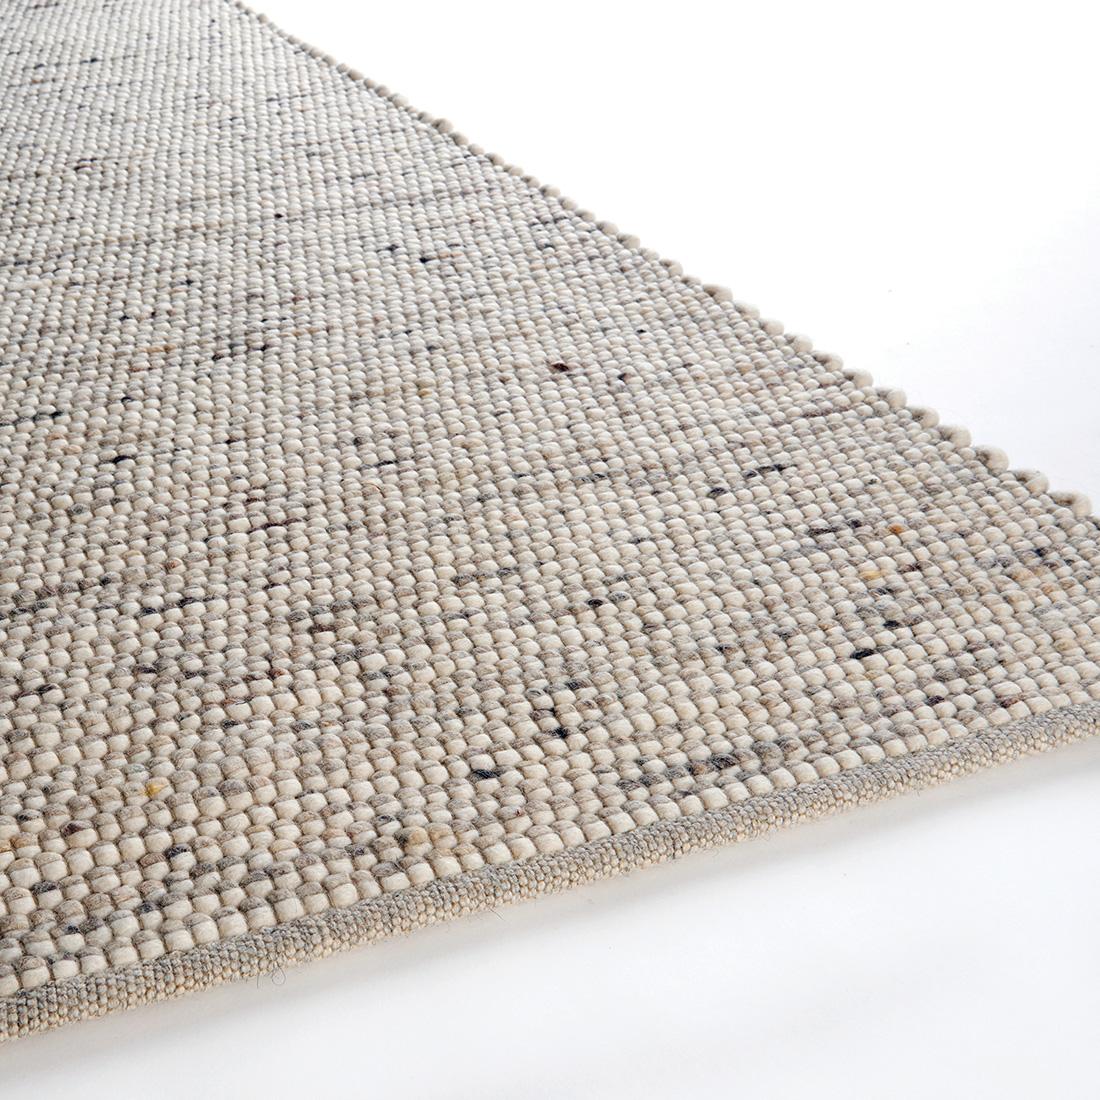 Vloerkleed Brinker Cliff 108 | 170 x 230 cm